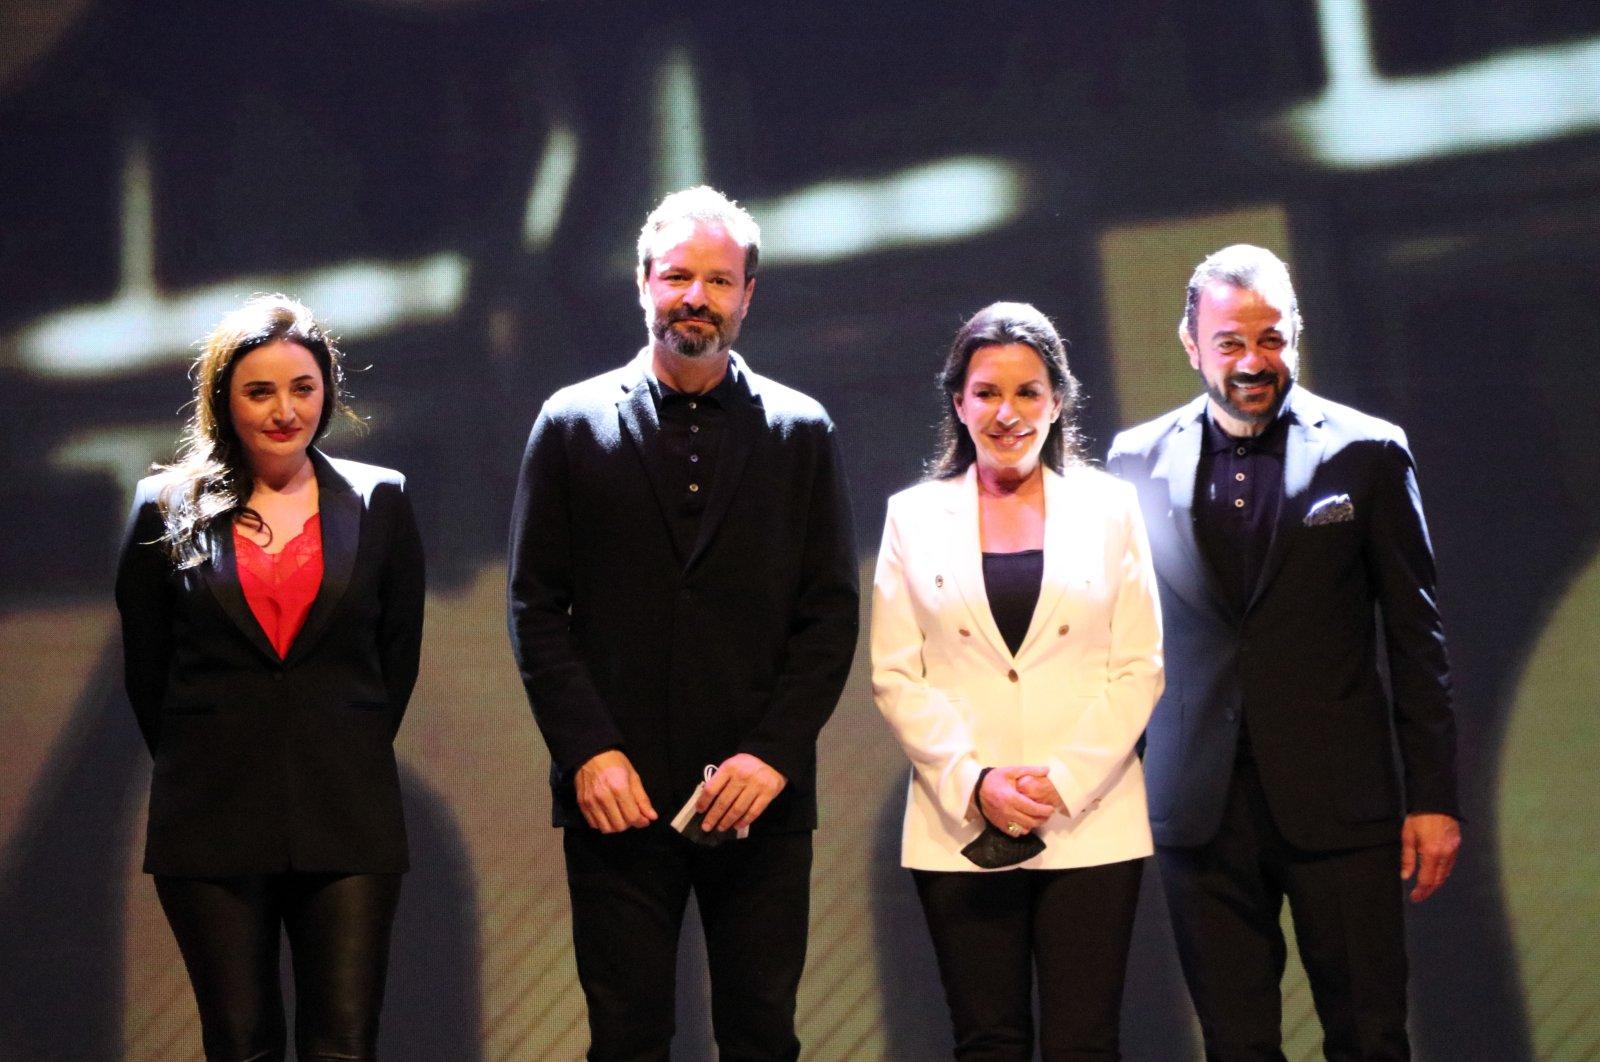 Jury membersFadik Sevin Atasoy (2nd L),Timür Savcı (L),Perihan Savaş (R),Kerem Alışık (2nd R), pose for a photo at the 6thGolden Baklava Film Academy International Student Film Festival, Gaziantep, Turkey, April 9, 2021. (AA Photo)